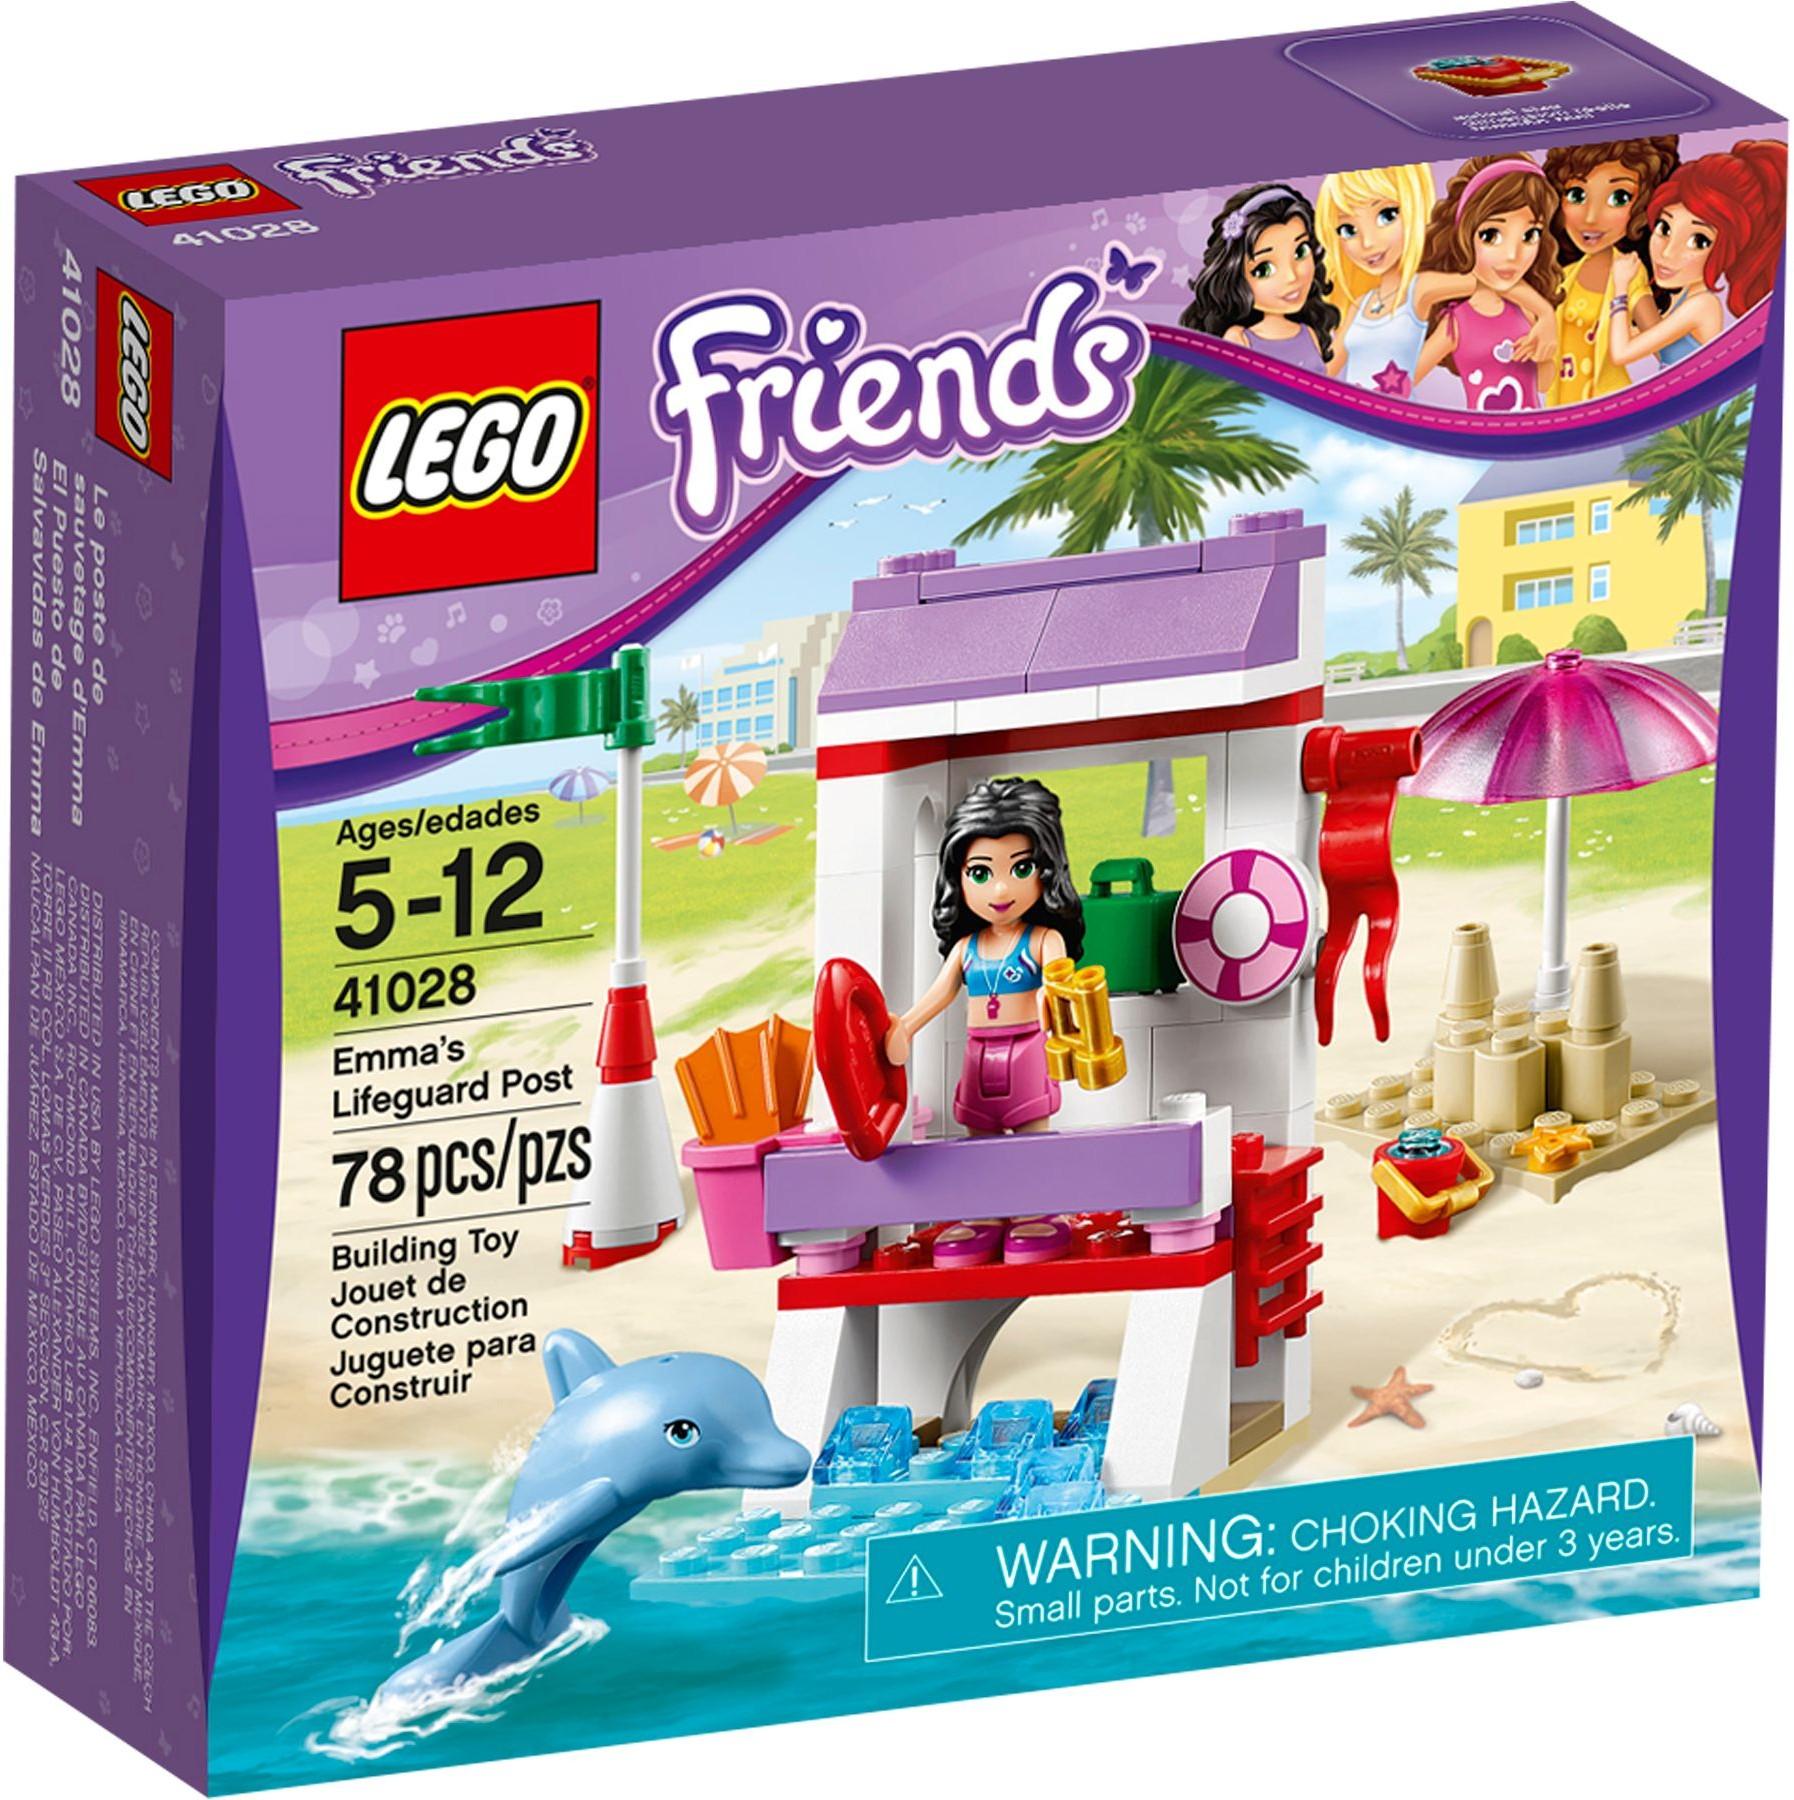 Lego Beach House Walmart: Emma's Lifeguard Post (41028)